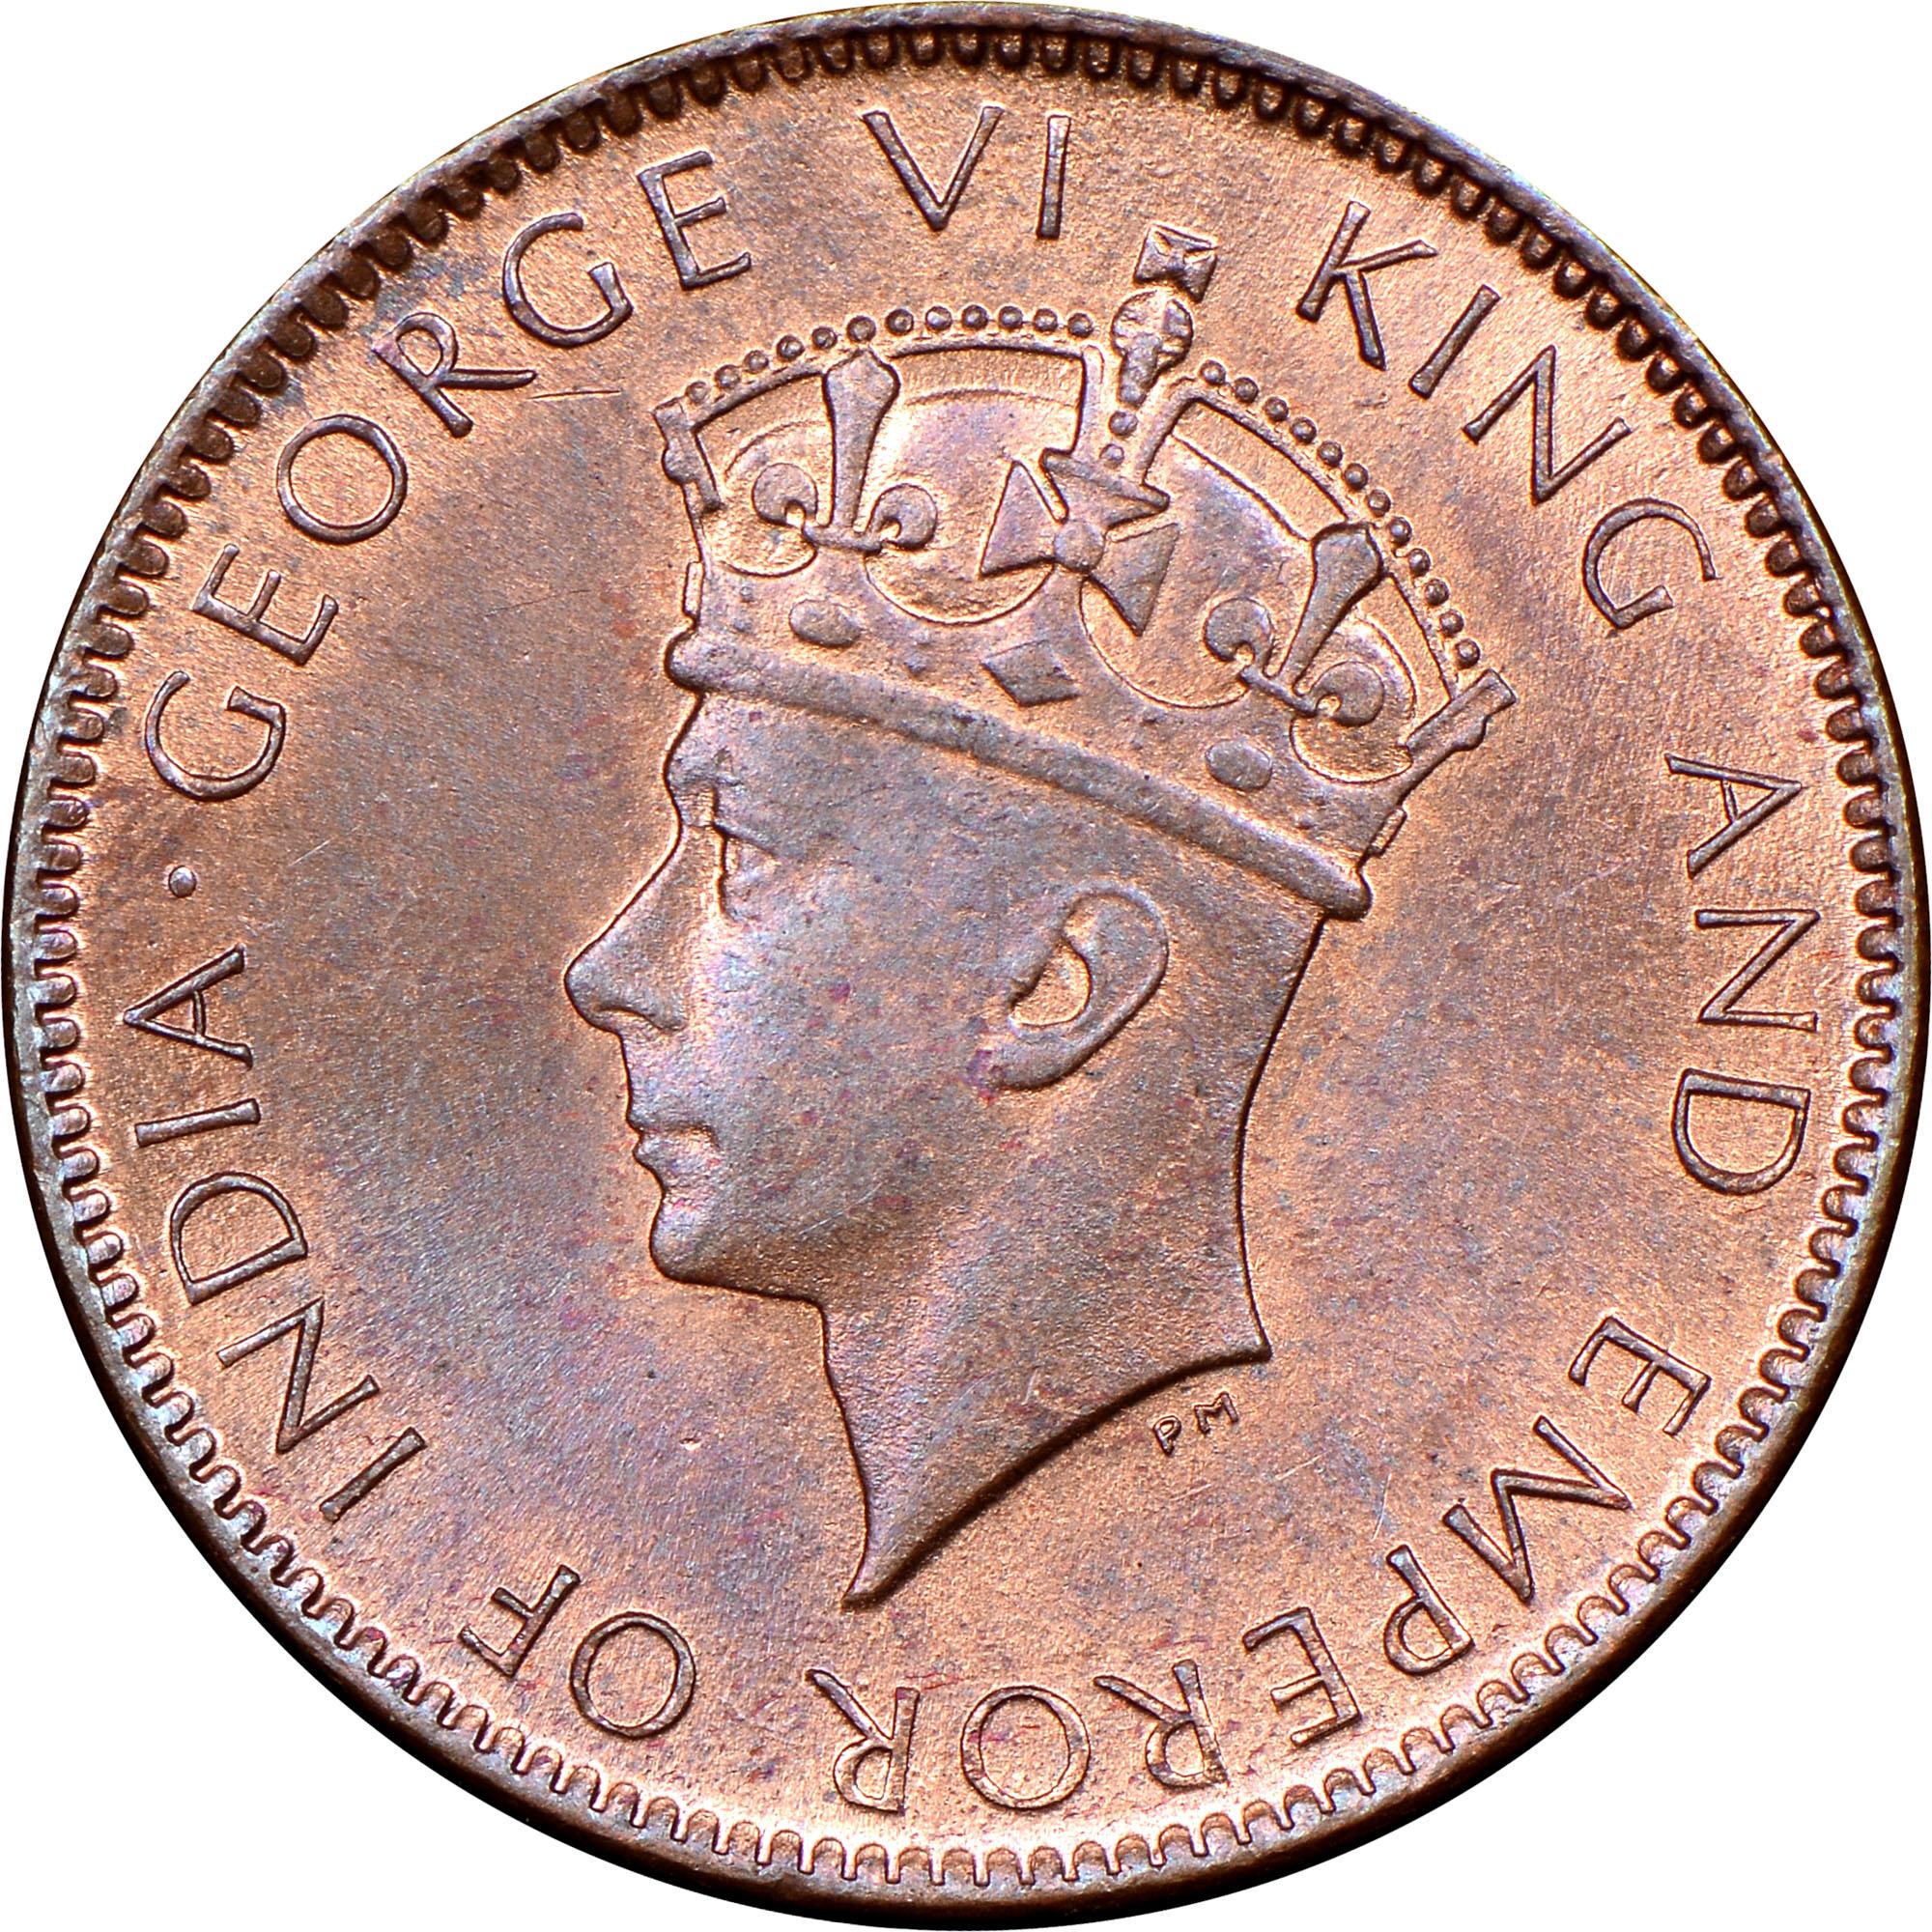 1937-1942 Ceylon Cent obverse